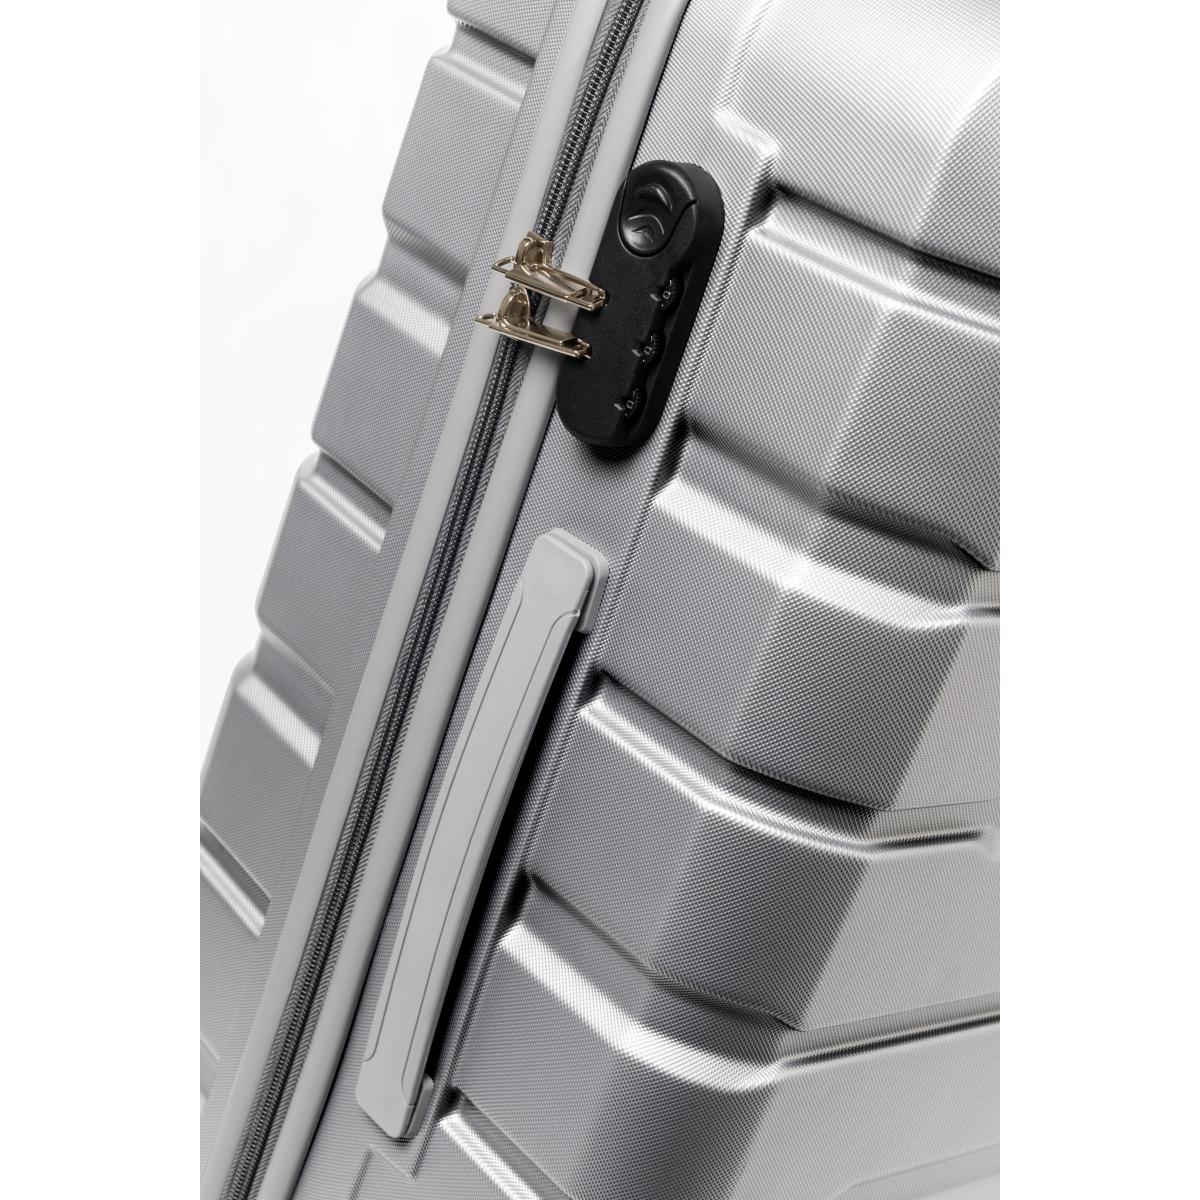 Gedox Abs Premium Tonaton 3'lü Valiz Seyahat Seti - Model:500.03  Gri